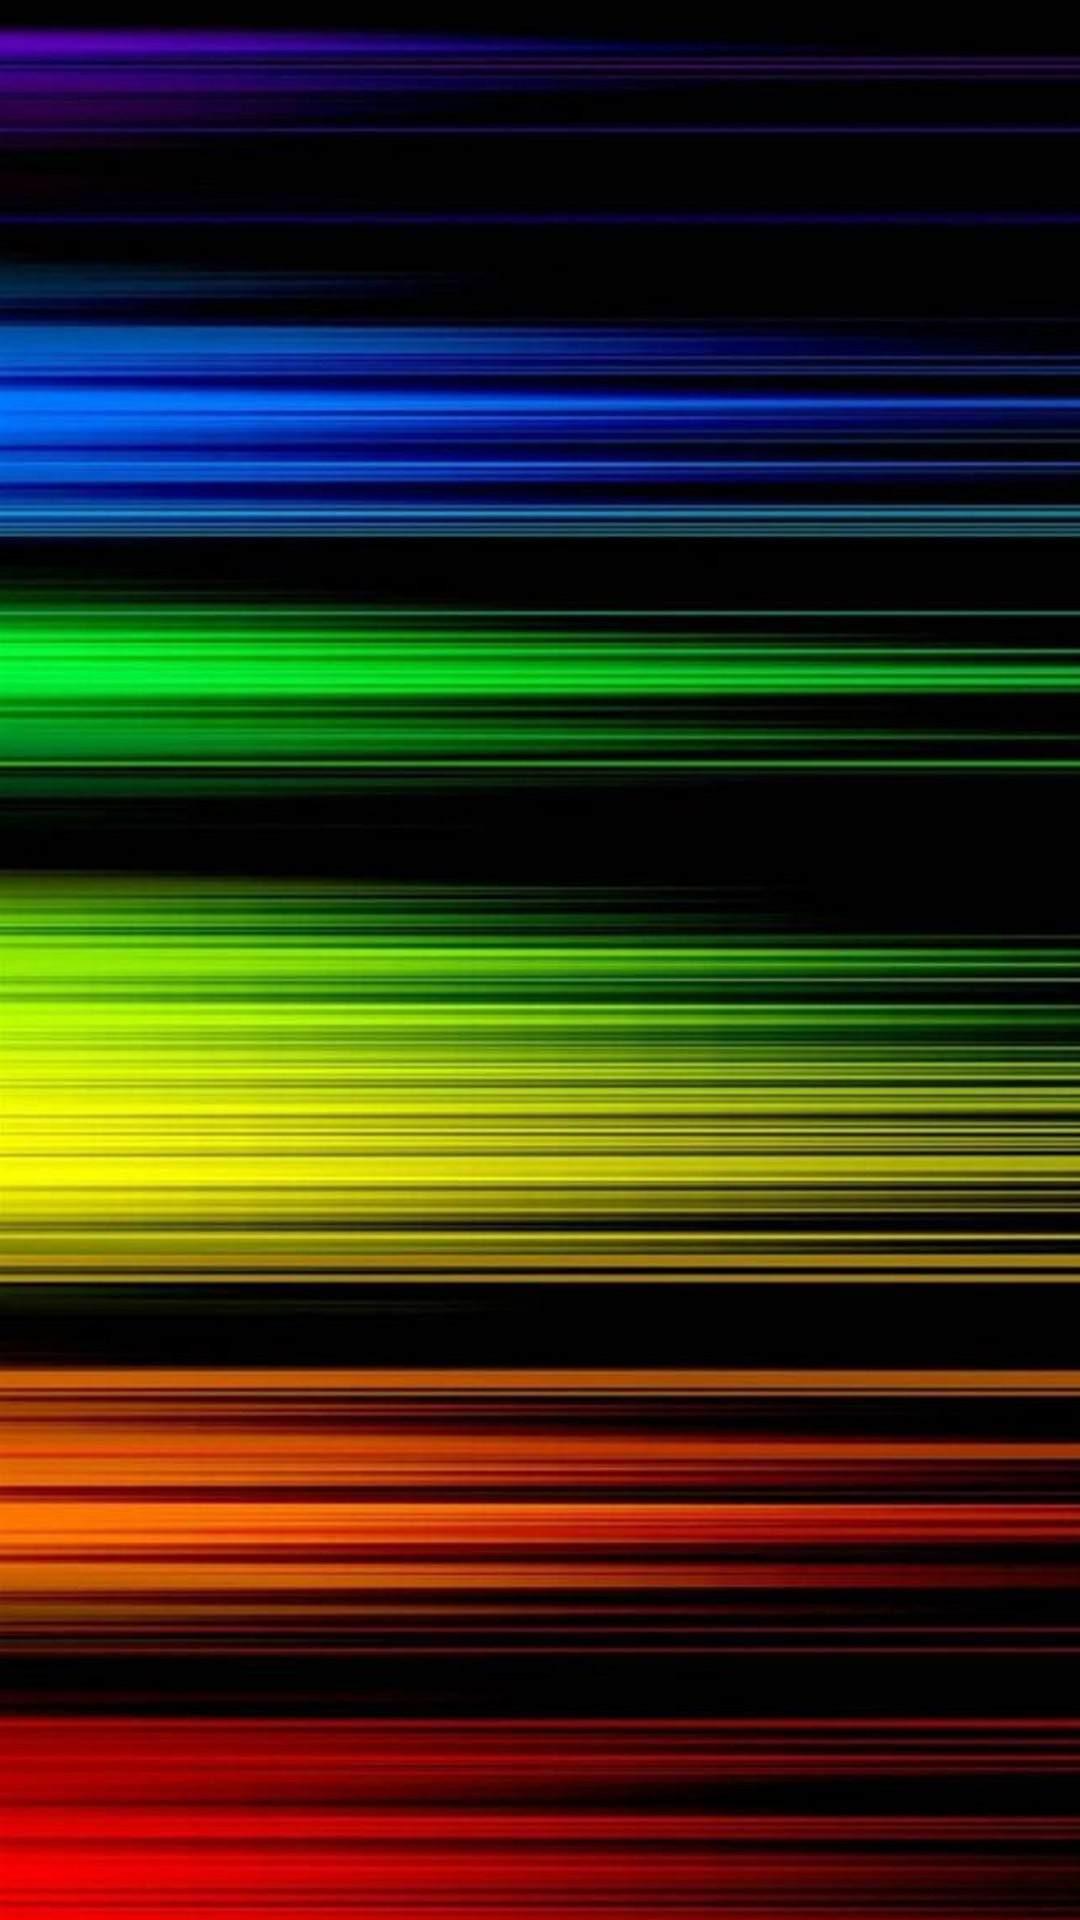 Colorful Iphone 6 Plus Wallpaper (1)